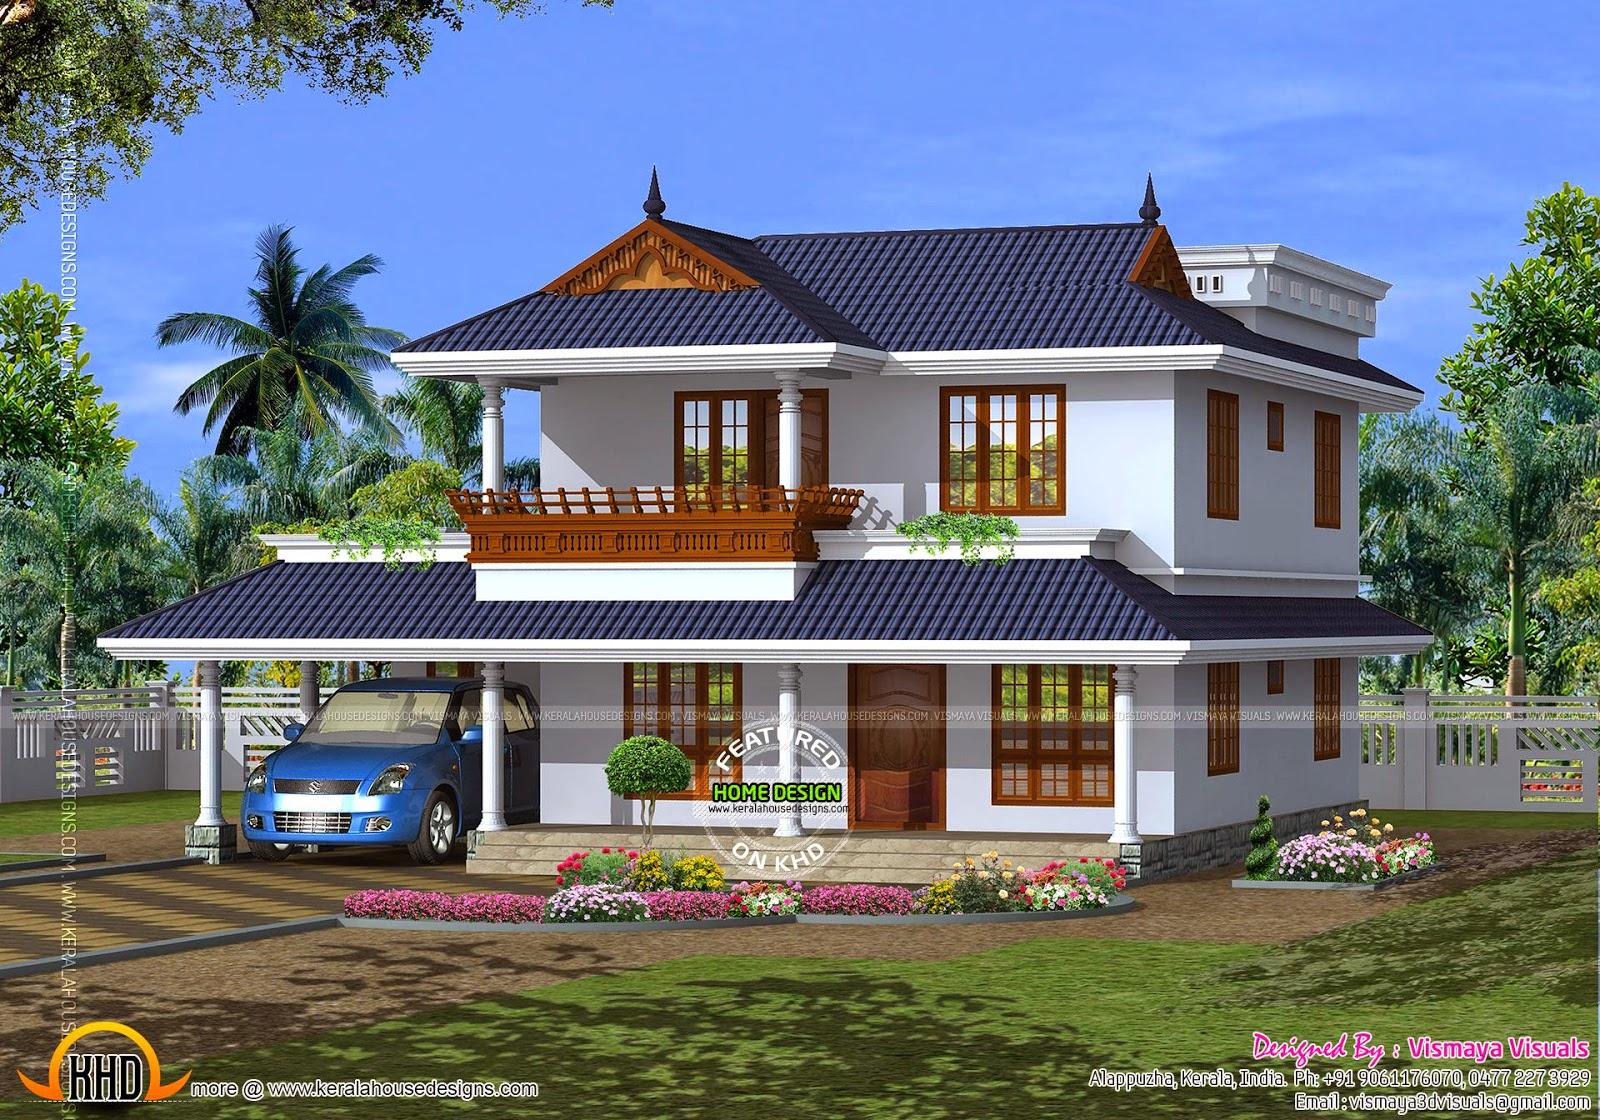 House model Kerala - Kerala home design and floor plans